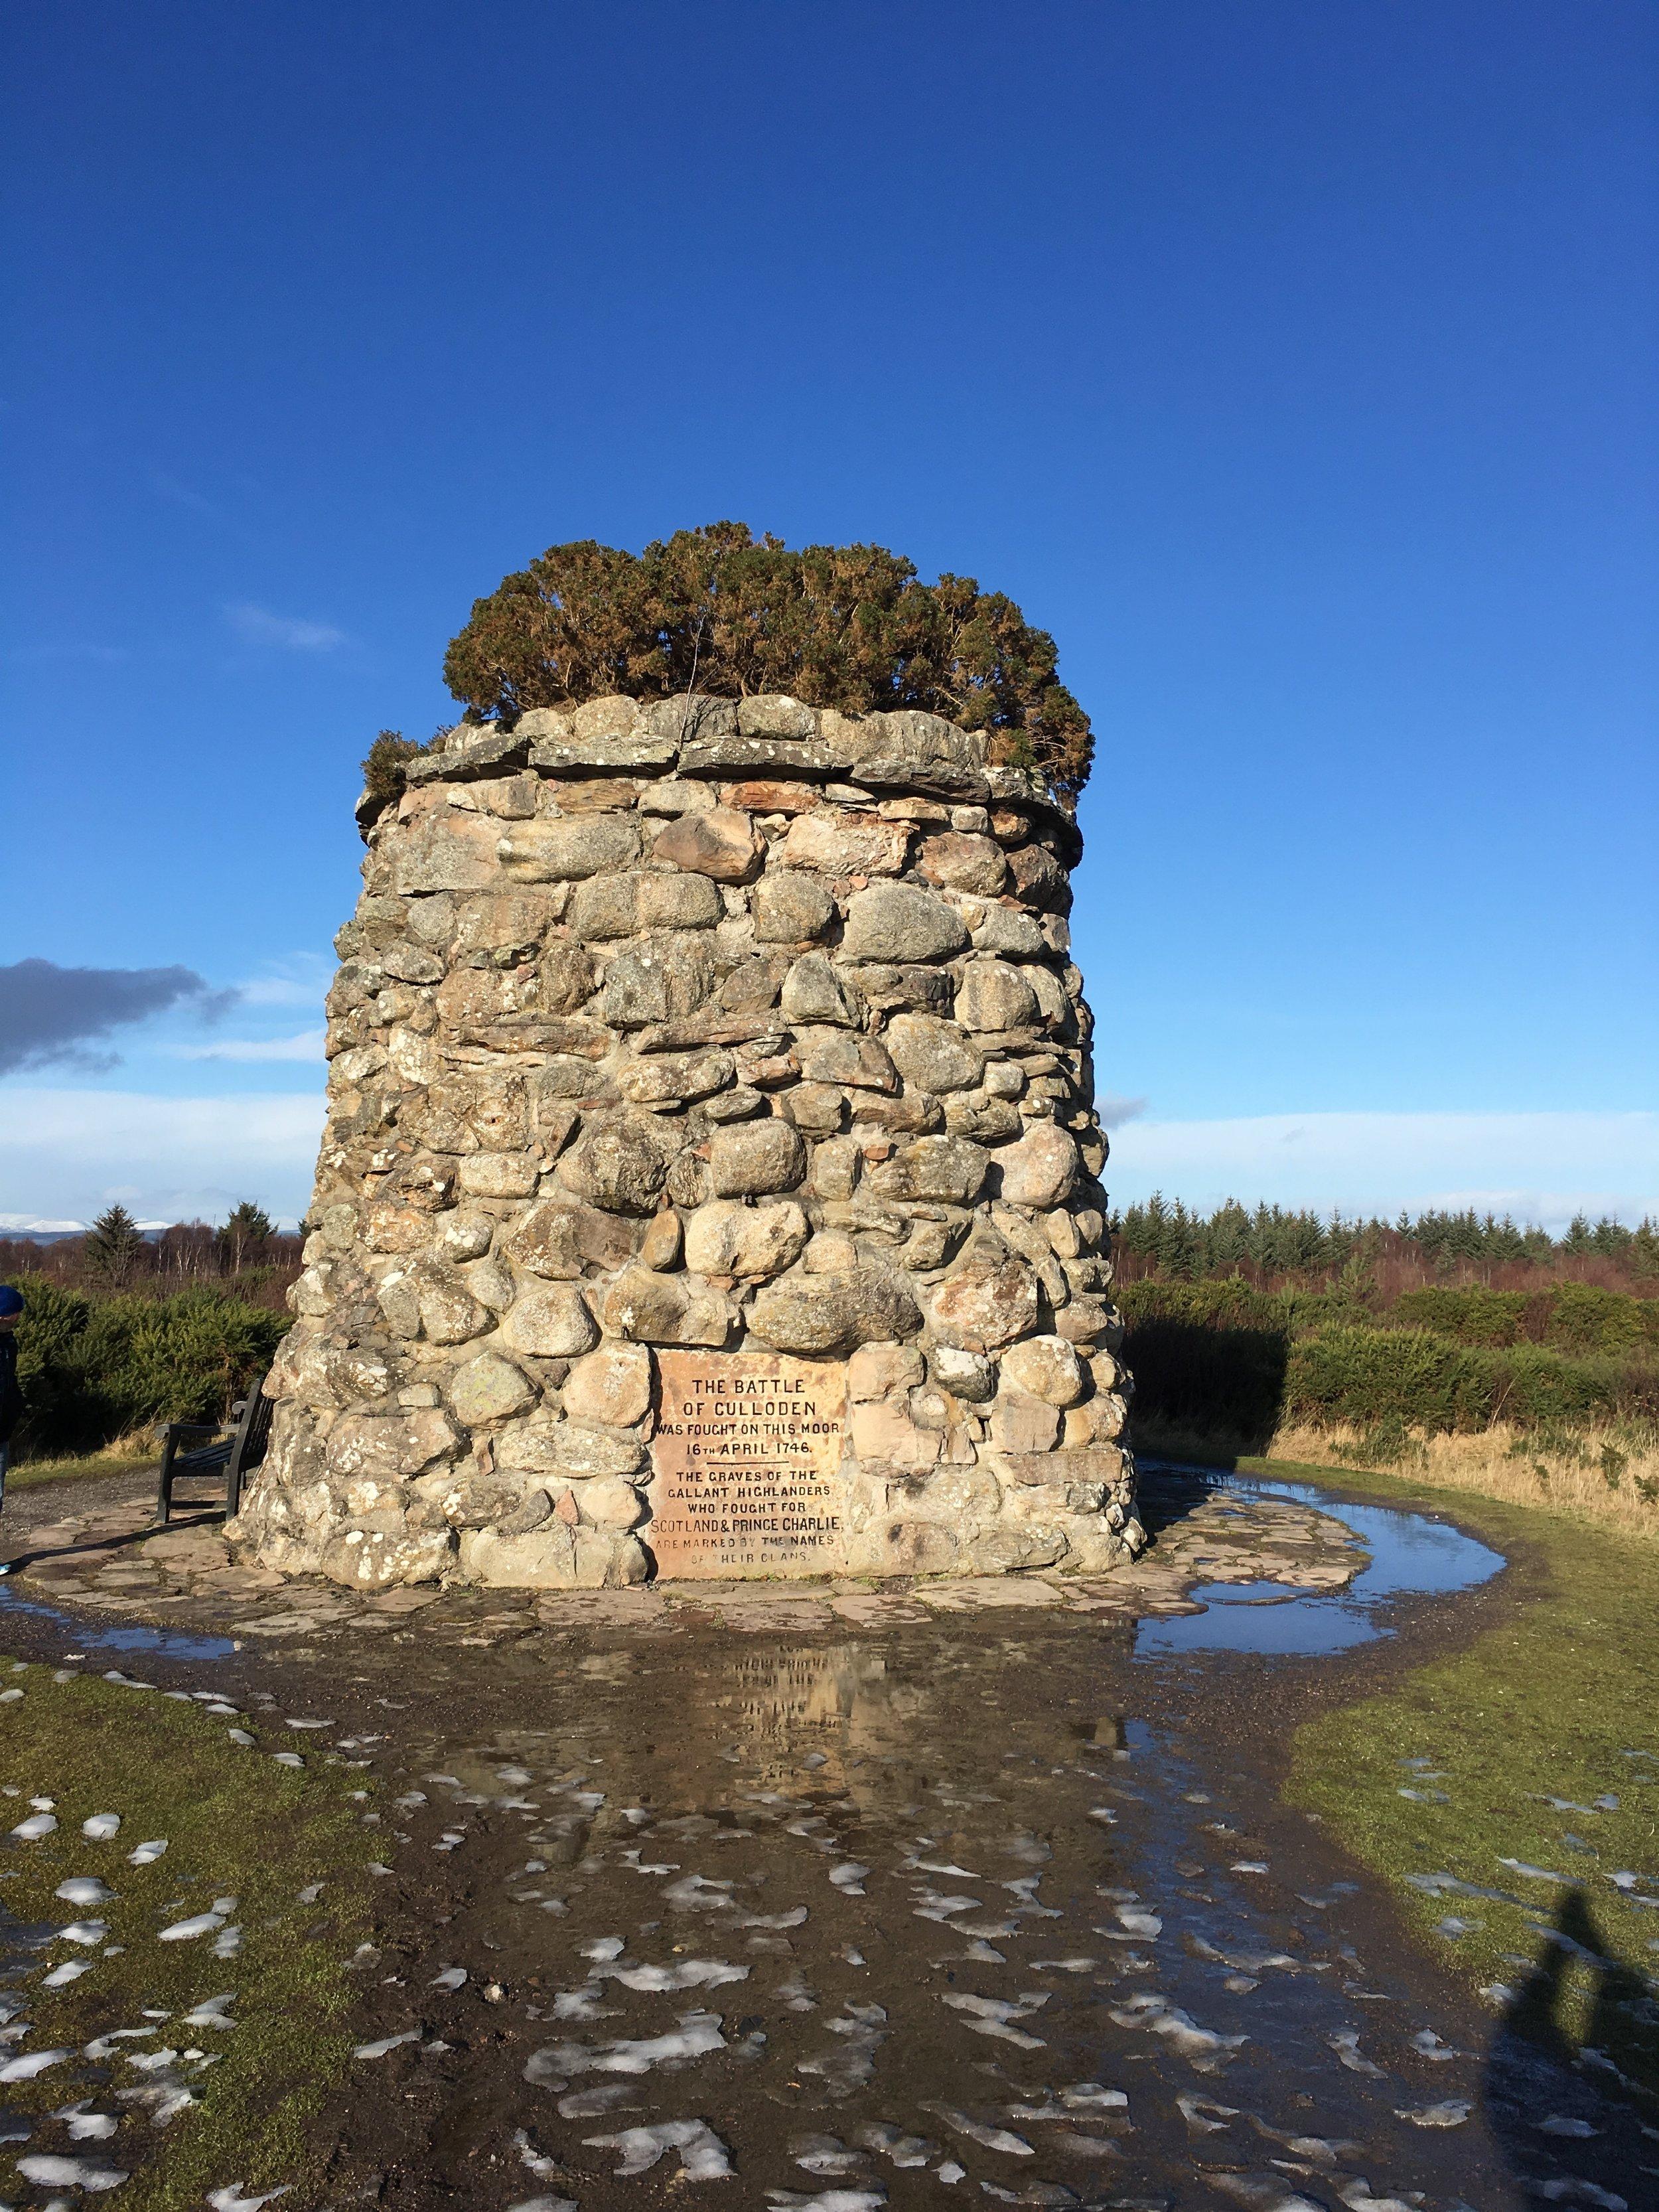 A memorial cairn at the battlefield.